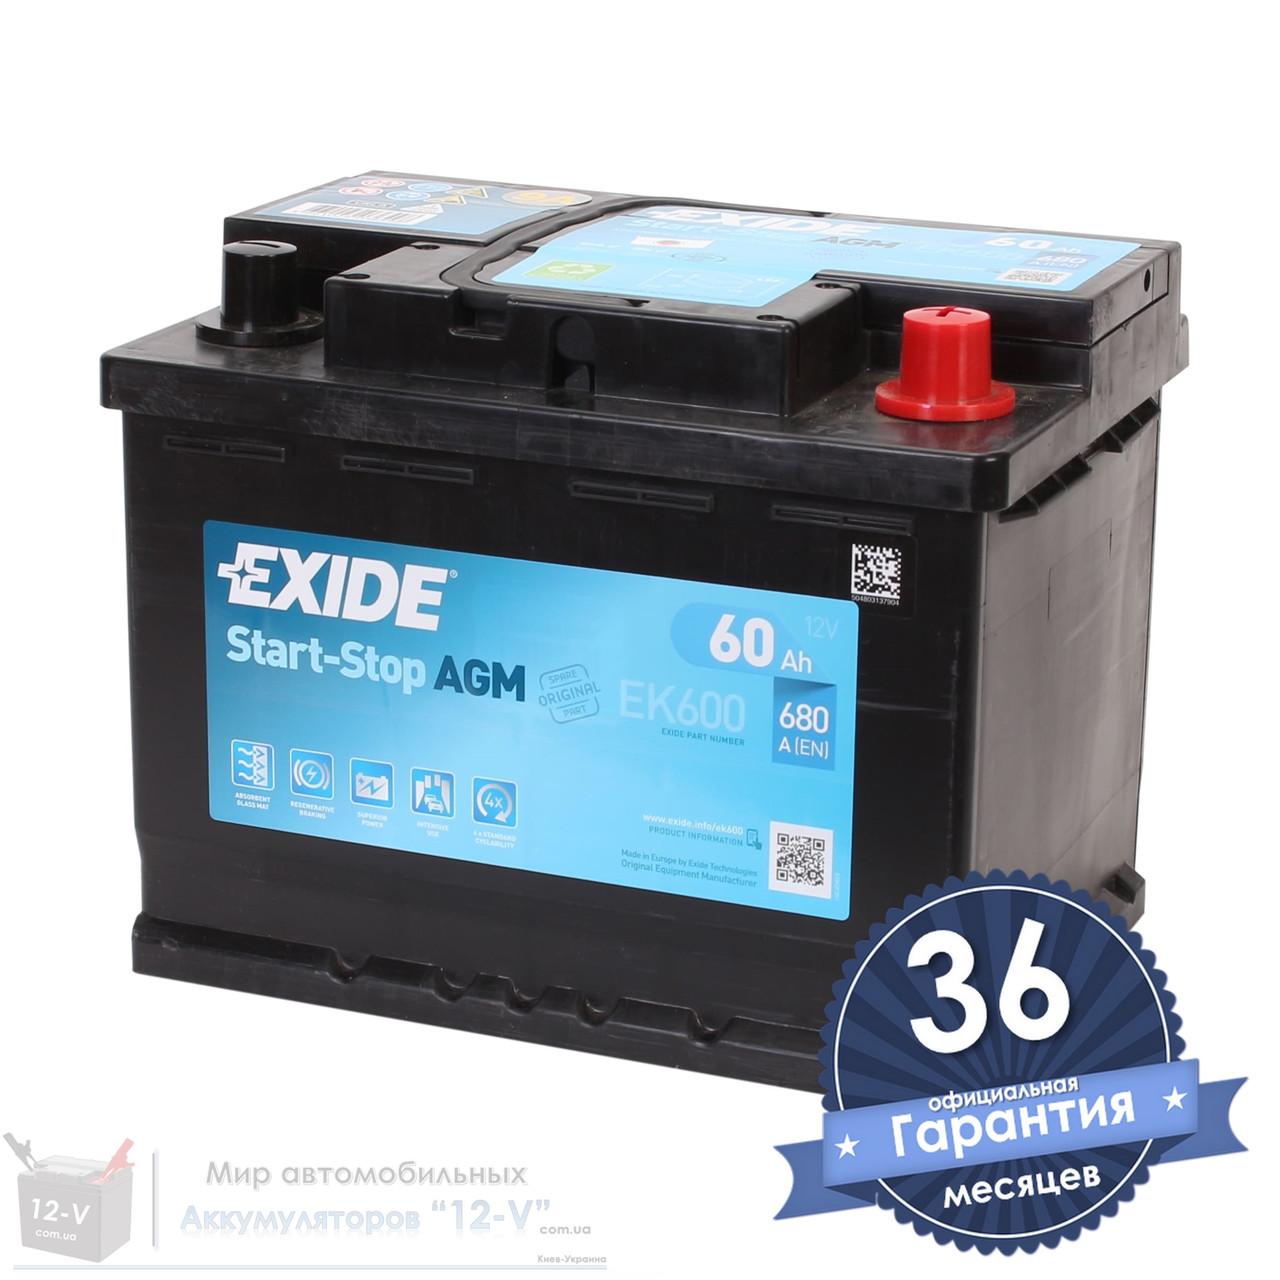 Аккумулятор автомобильный EXIDE AGM 6CT 60Ah, пусковой ток 680А [–|+] (EK600)